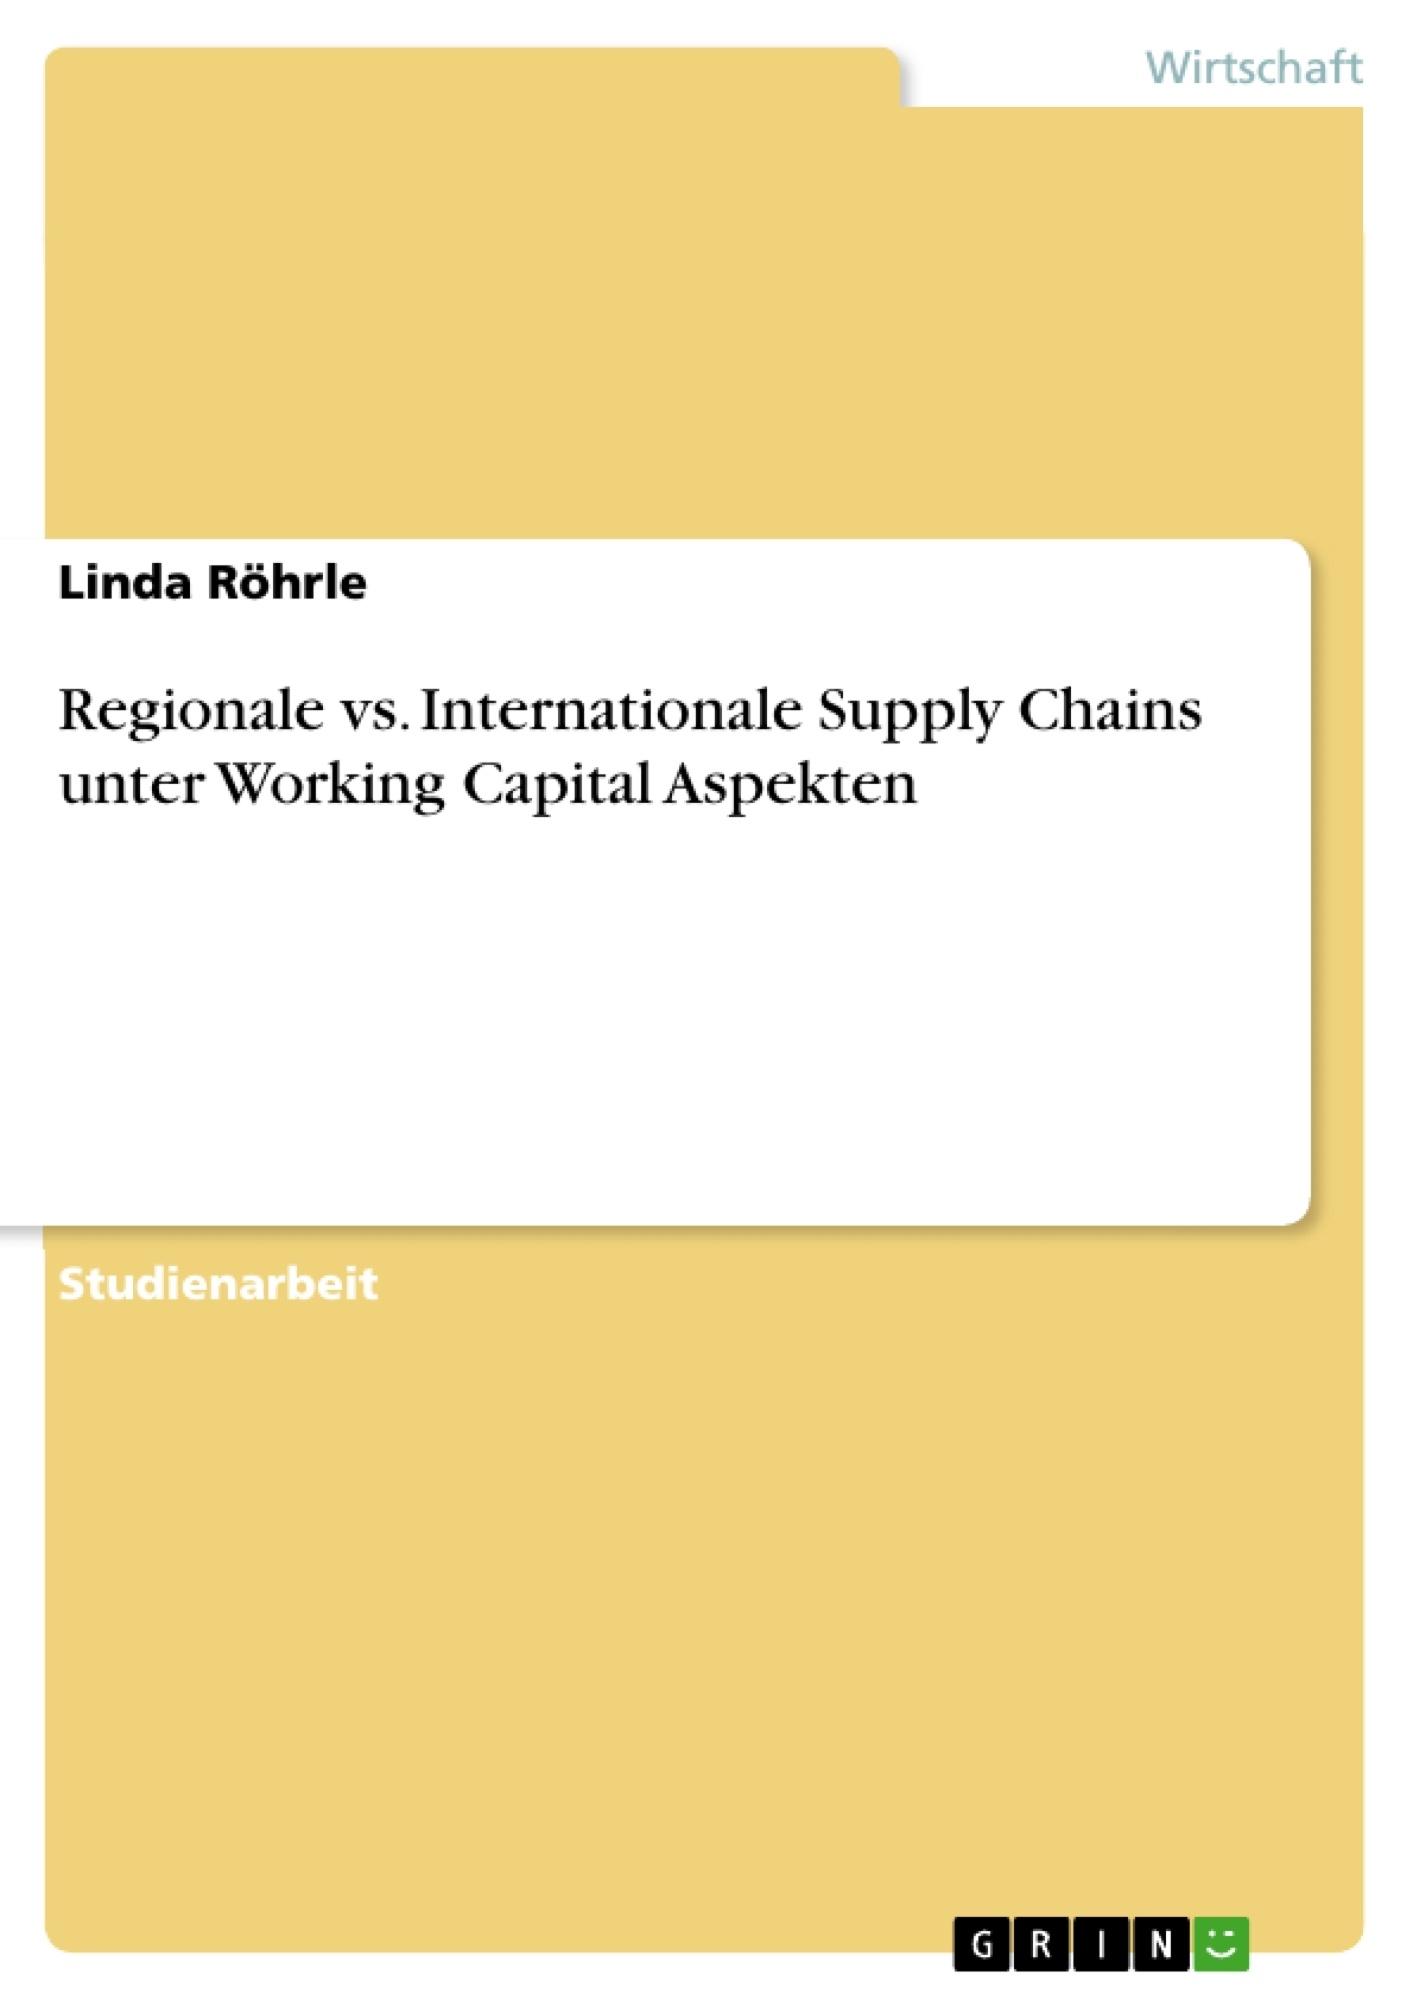 Titel: Regionale vs. Internationale Supply Chains unter Working Capital Aspekten